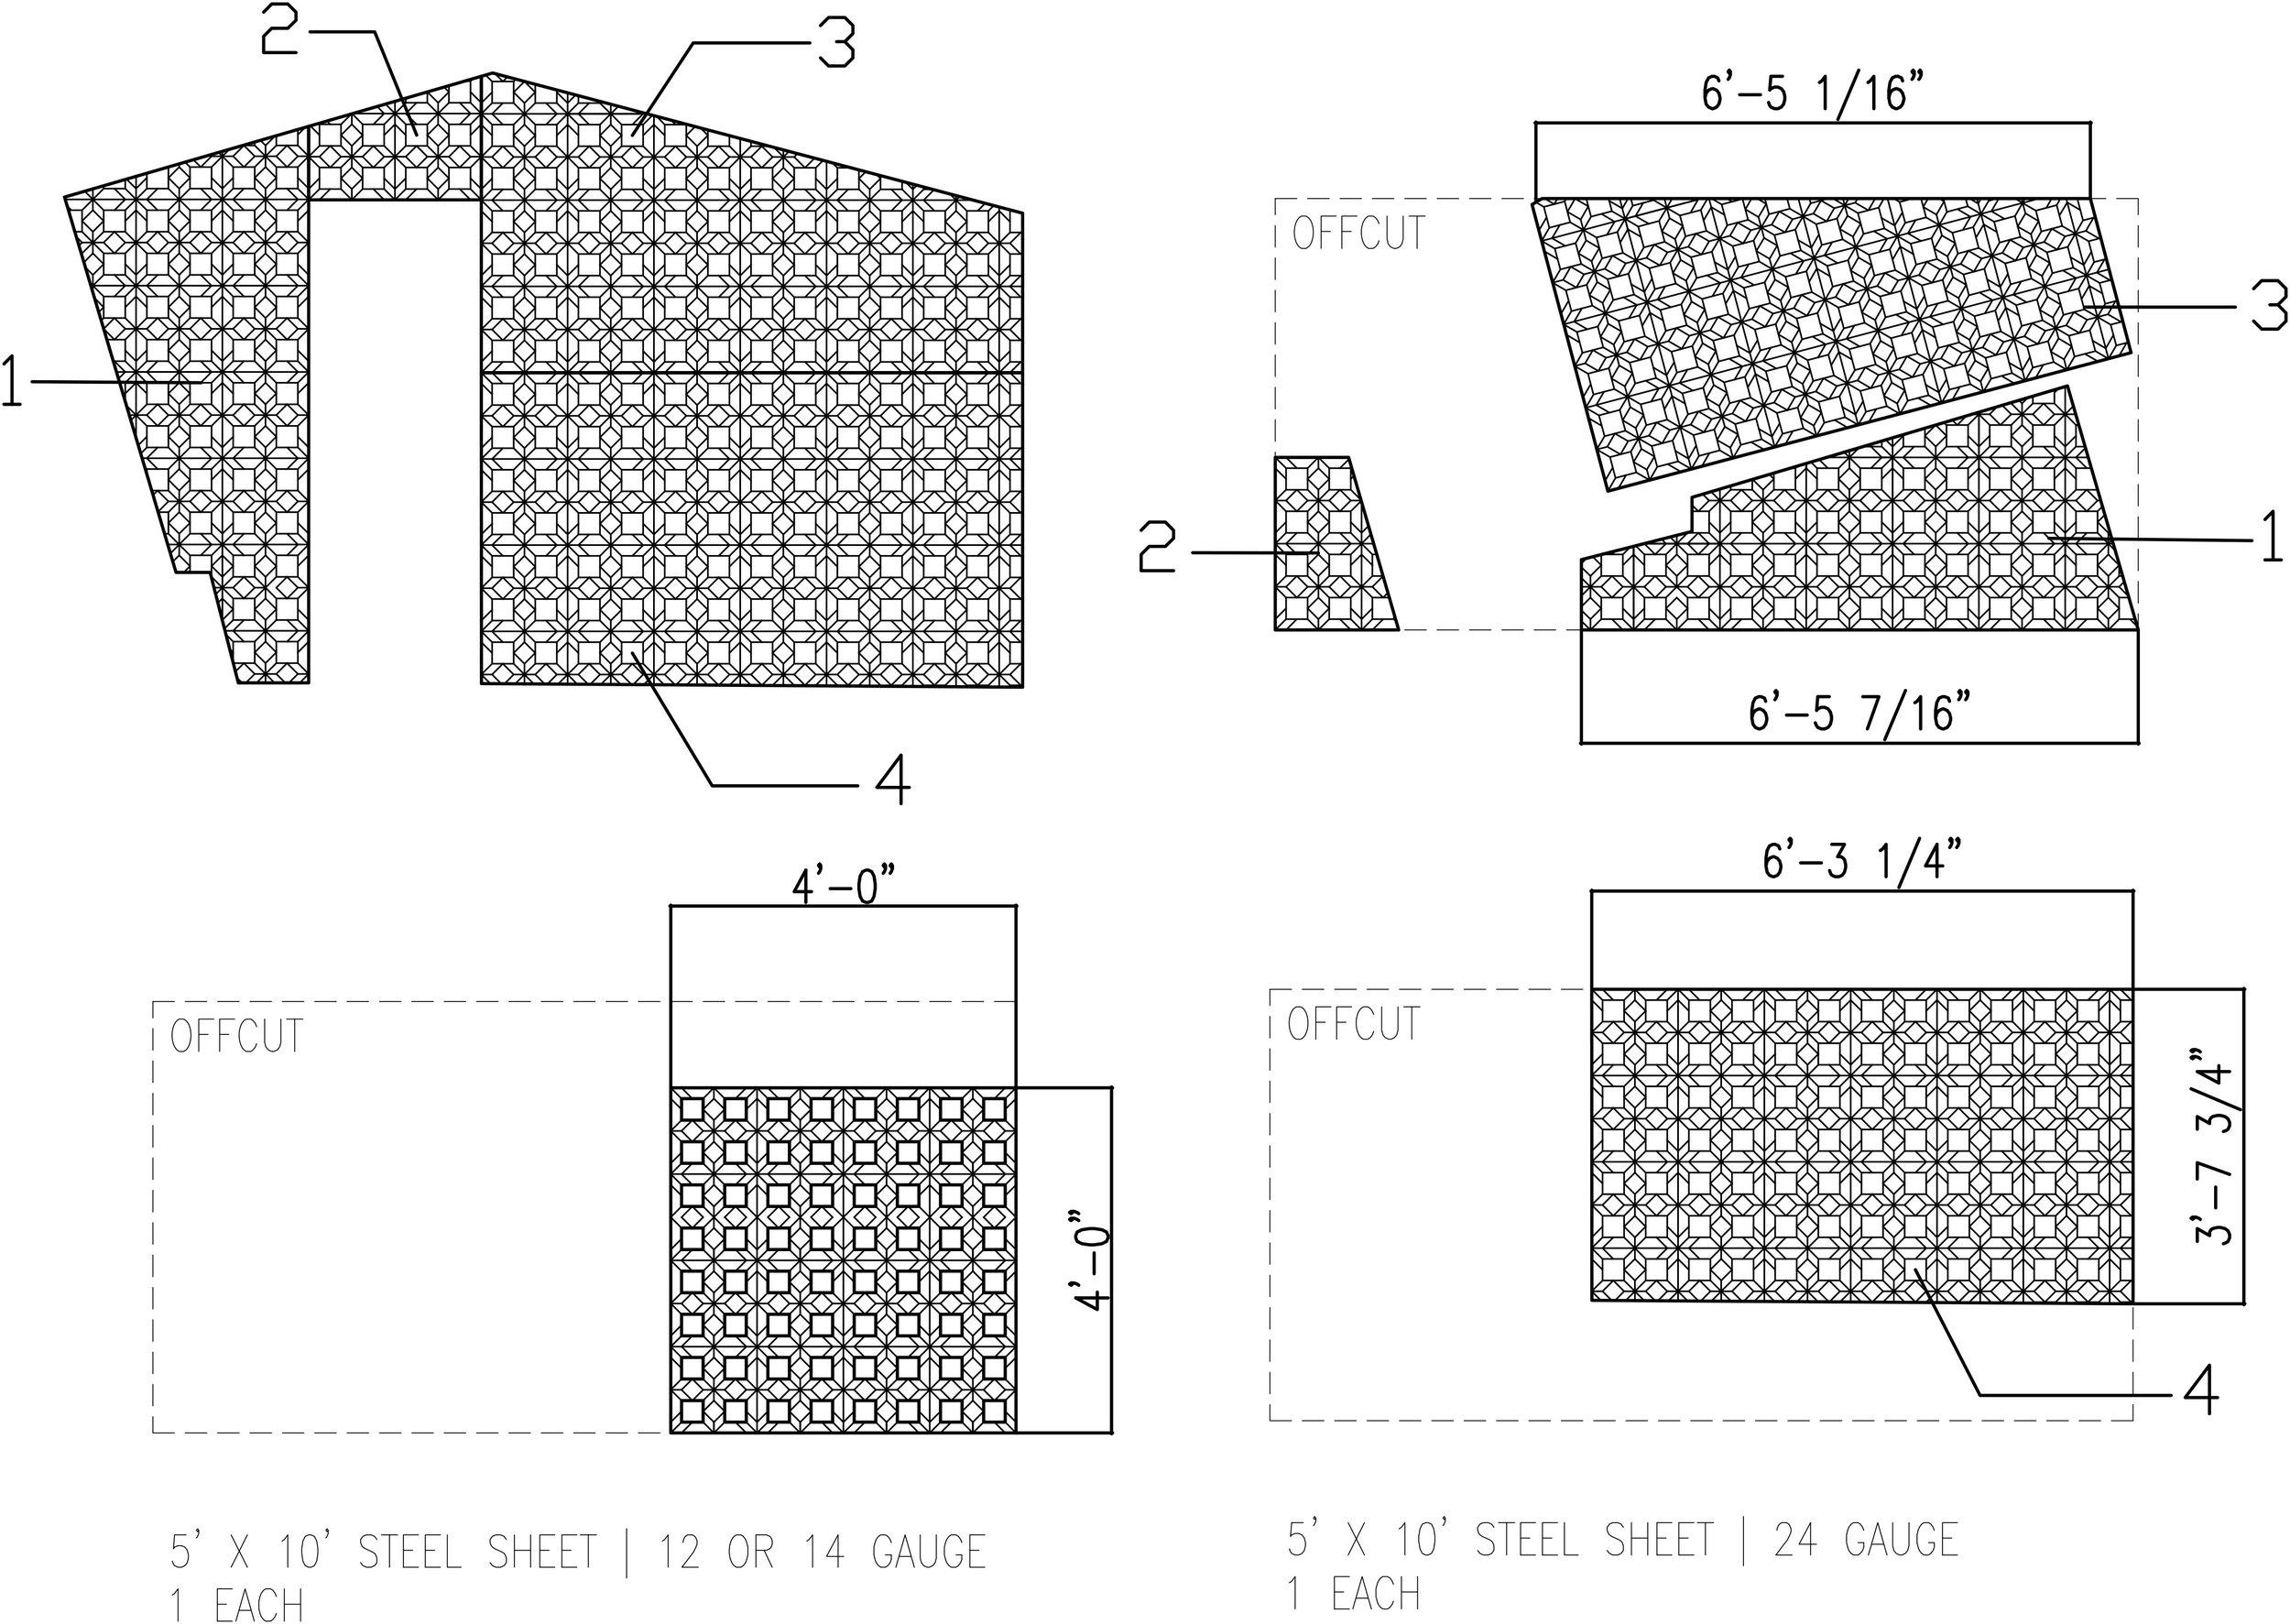 2017_DI_004 screen pieces.jpg